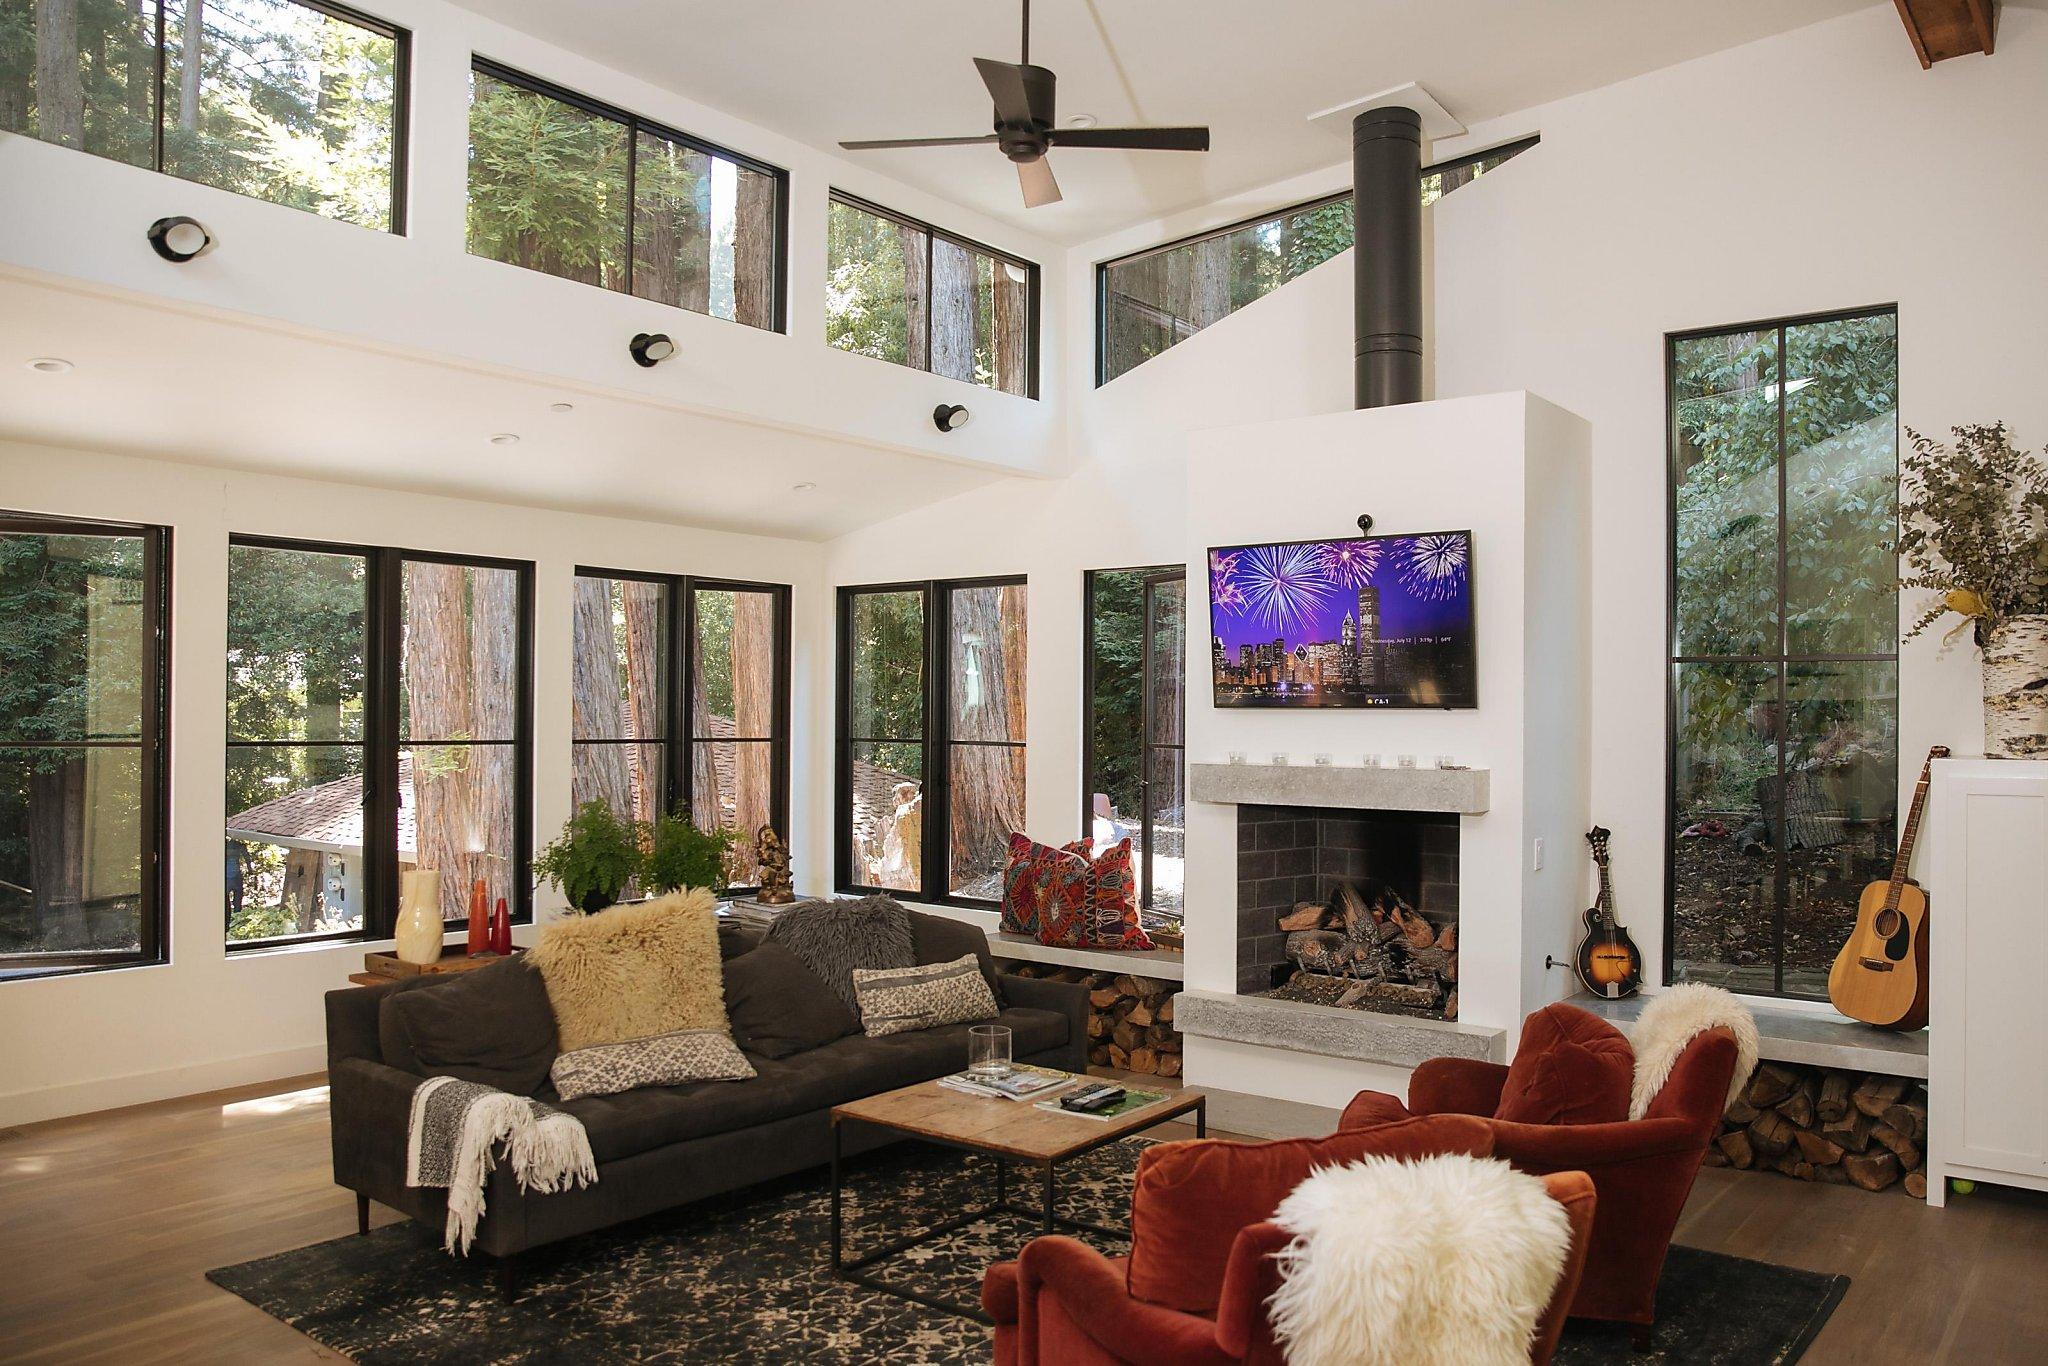 Kathleen Craven And Roark VanDienu0027s Living Room At Their Home In Mill  Valley, Calif.